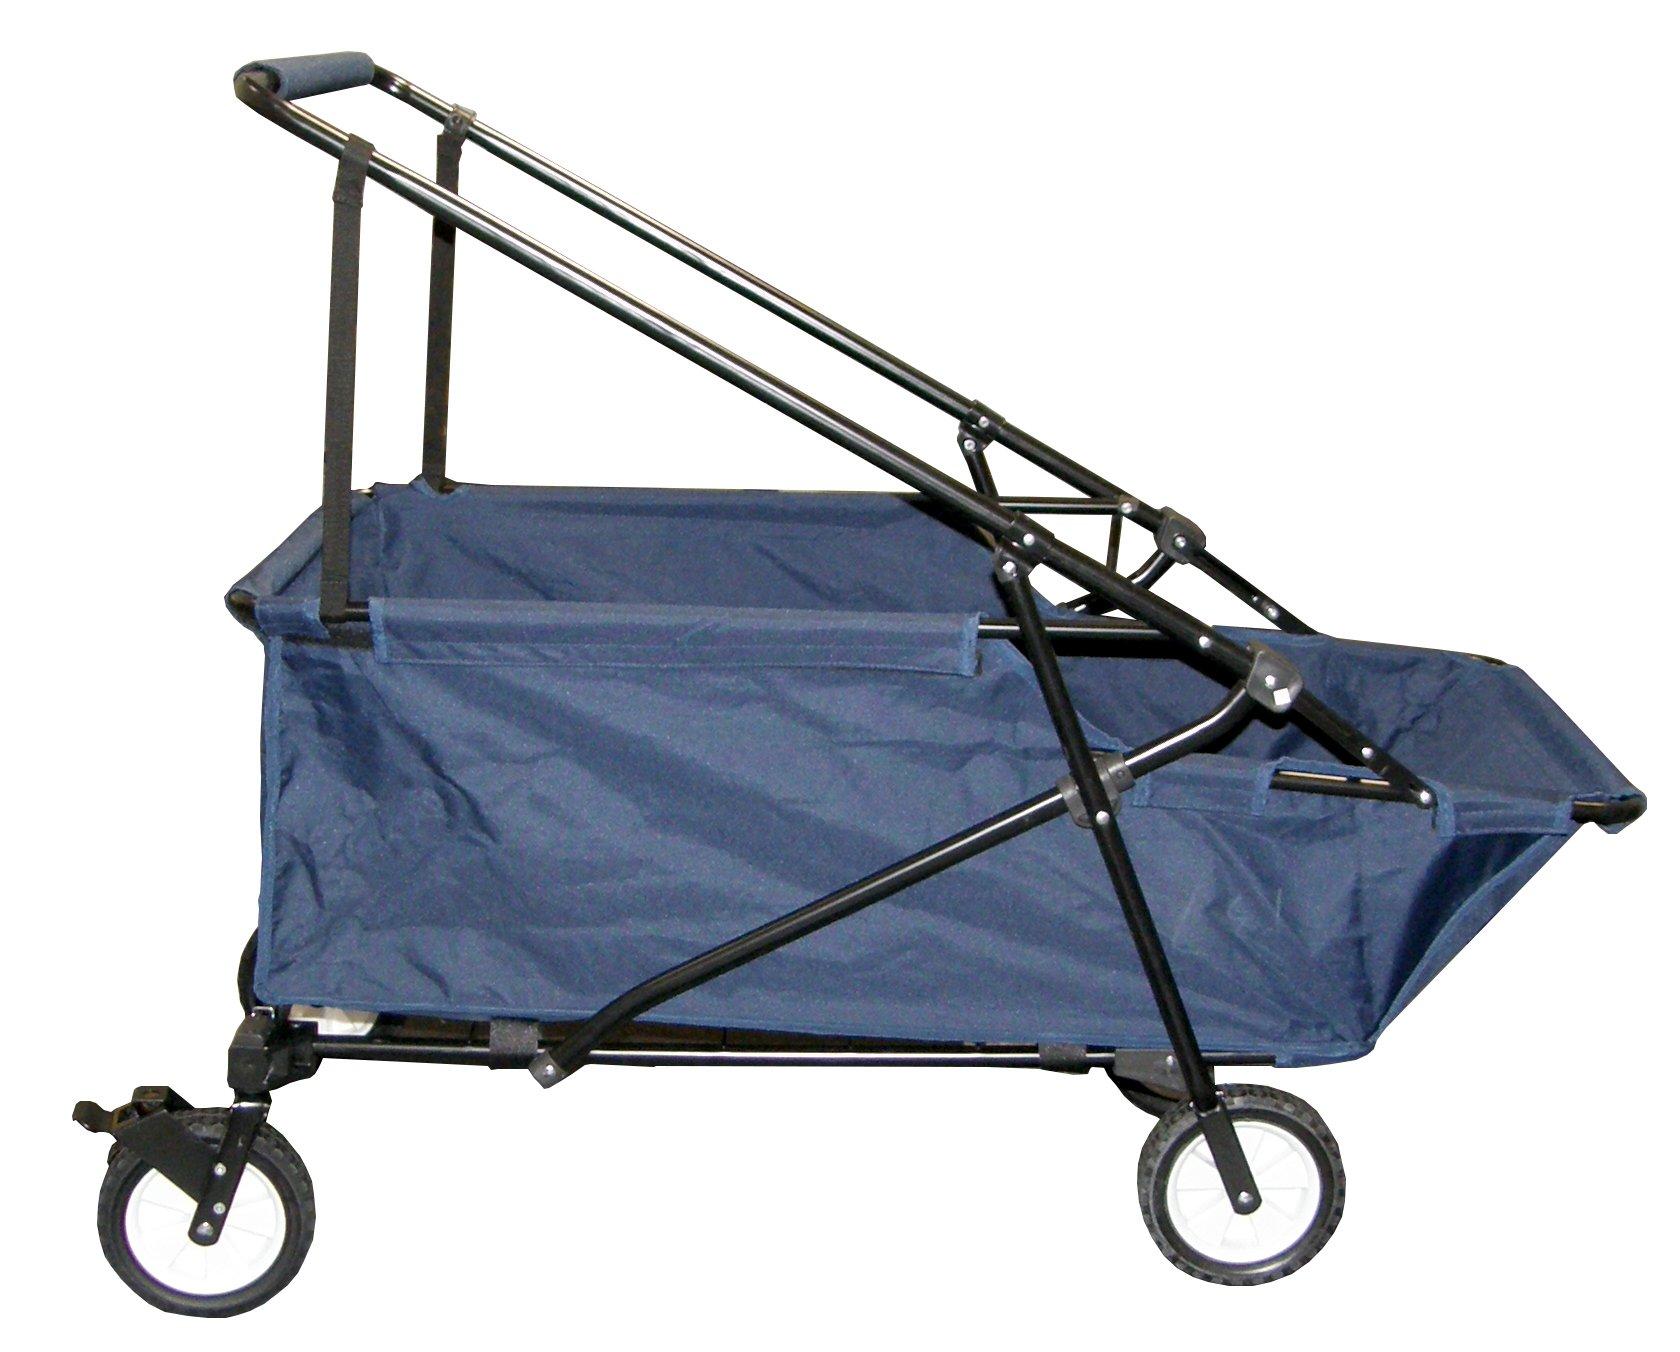 Impact Canopy Folding Utility Wagon, Collapsible, All Terrain Beach Wagon, Momentum, Navy Blue